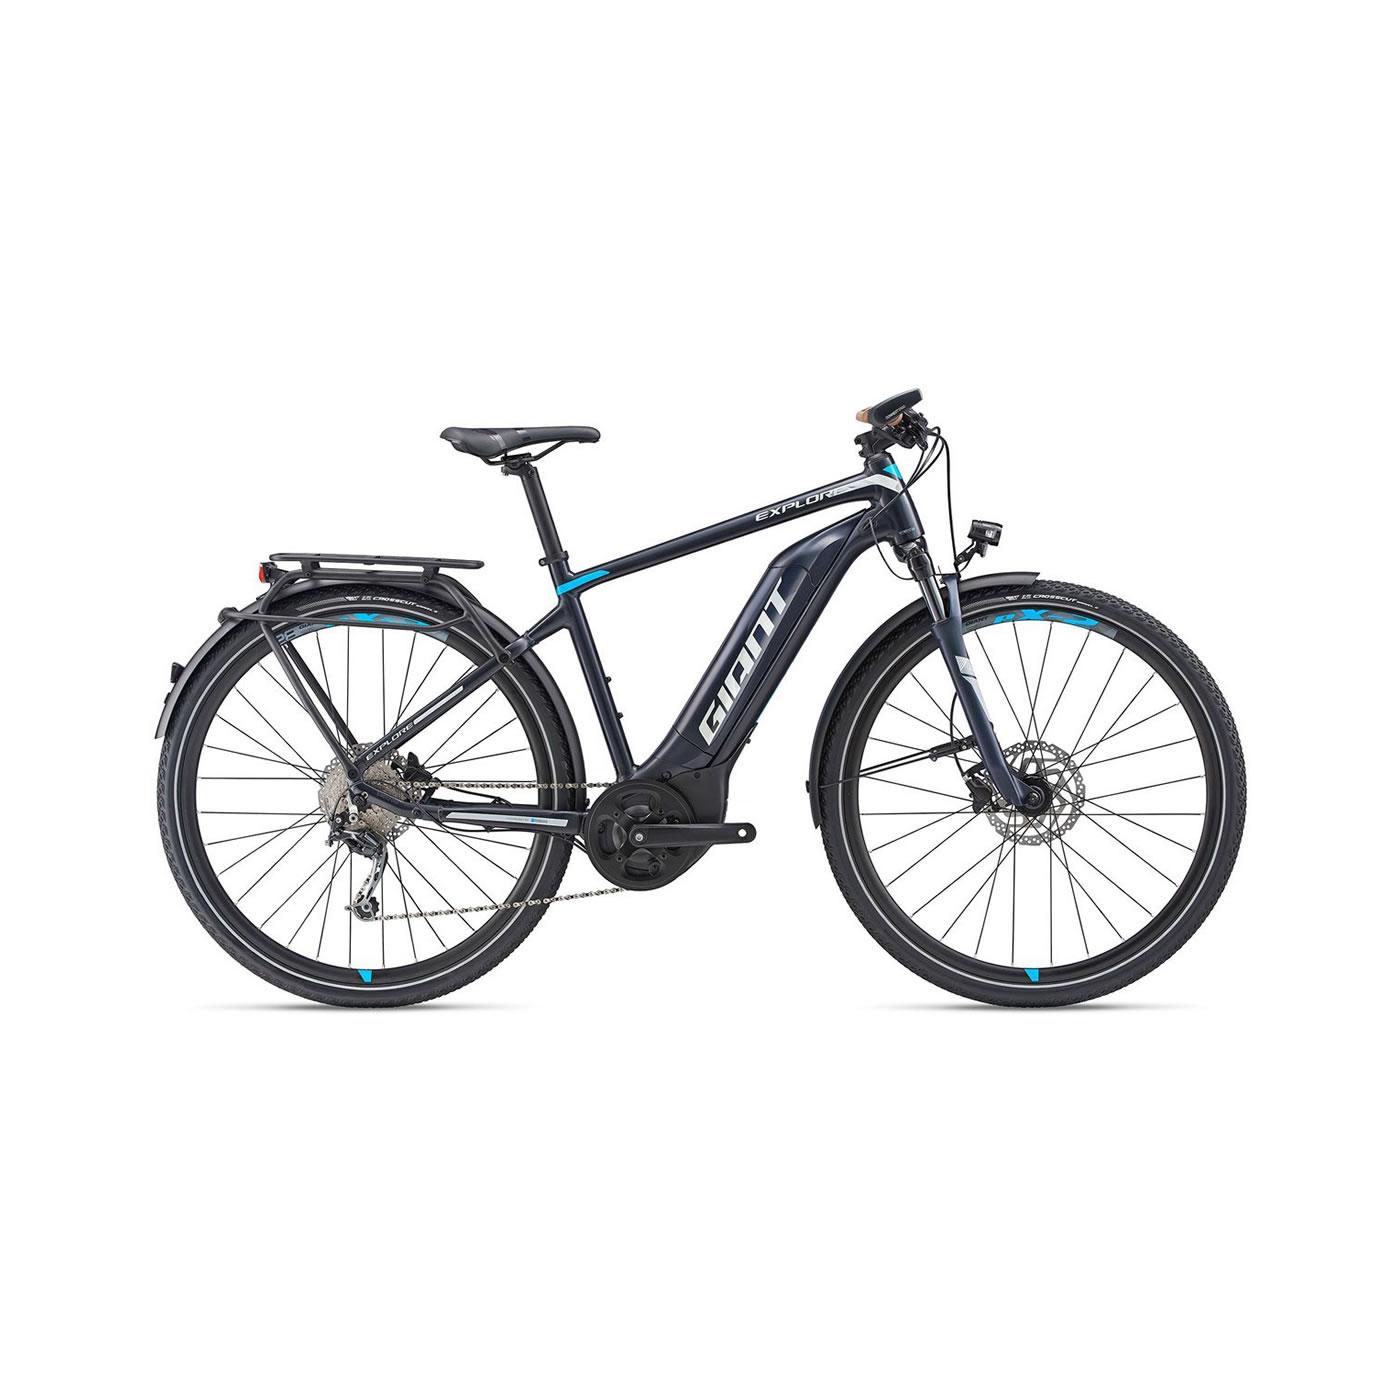 Giant Explore E+ 2 2019 - Electric Hybrid Bike